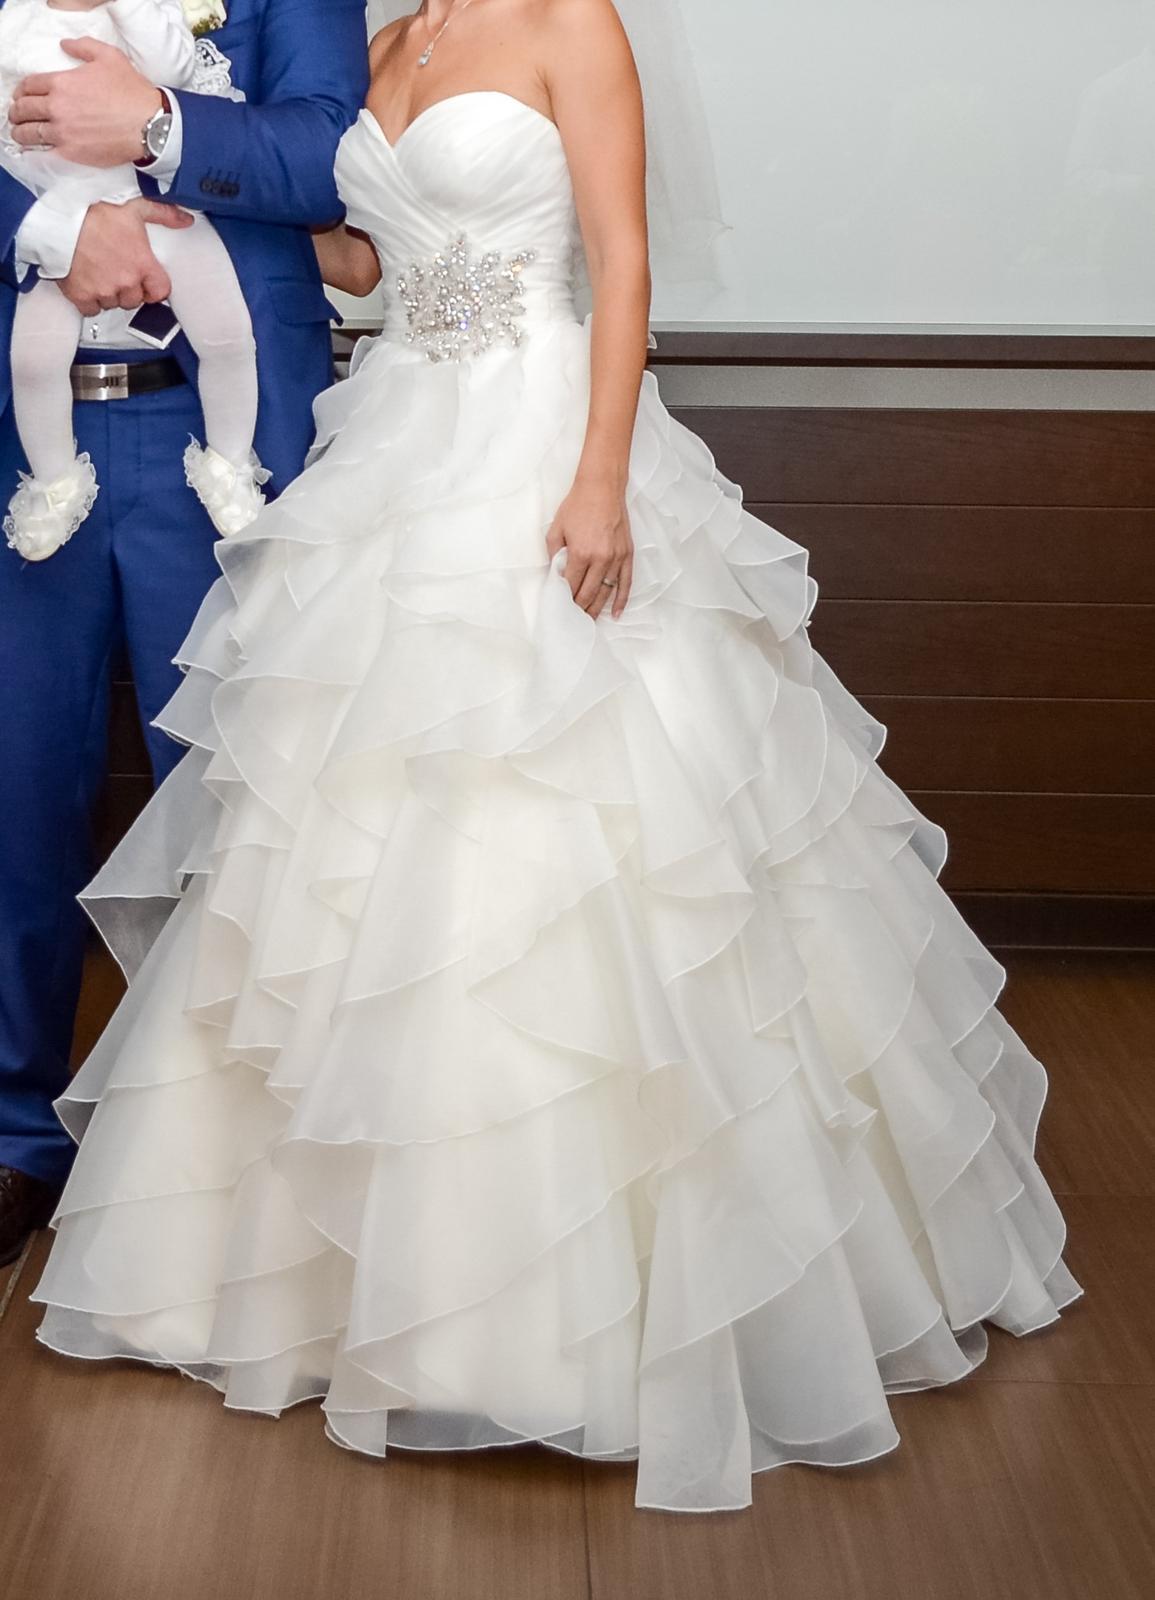 2eadb5358b Svadobné šaty allure bridals zo salóna diva